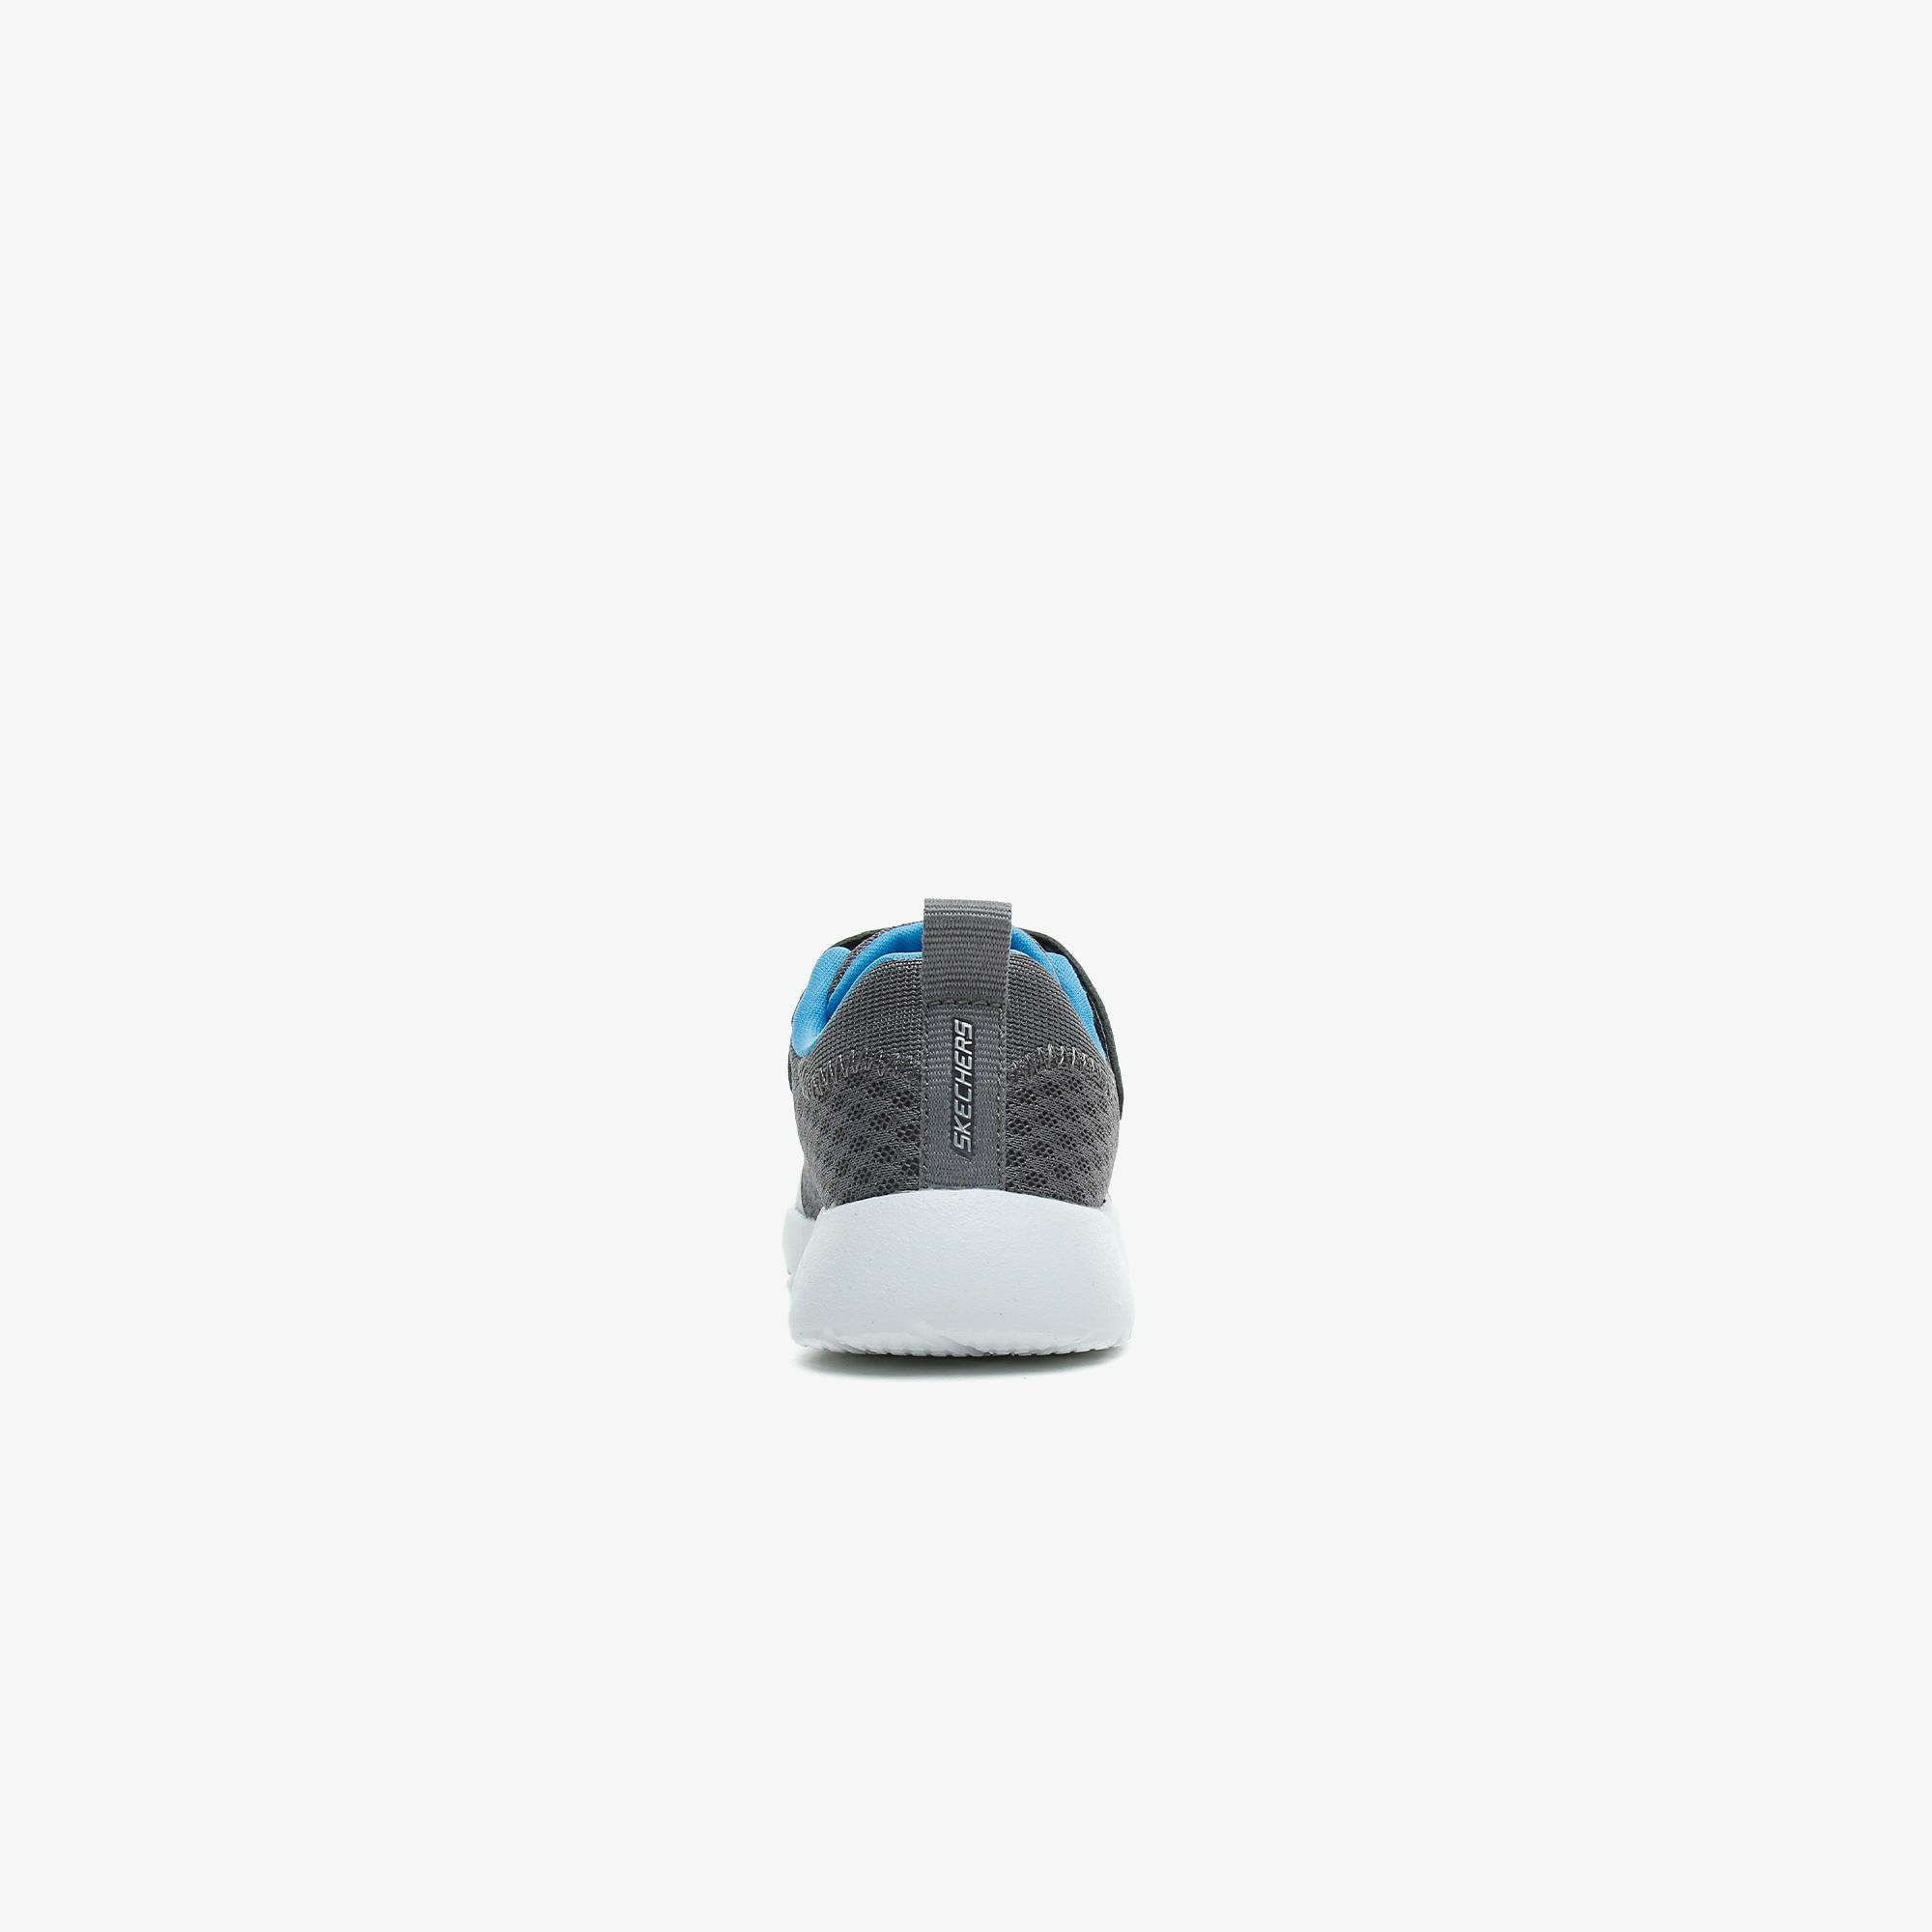 Skechers Dynamight-Hyper Torque Bebek Gri Spor Ayakkabı